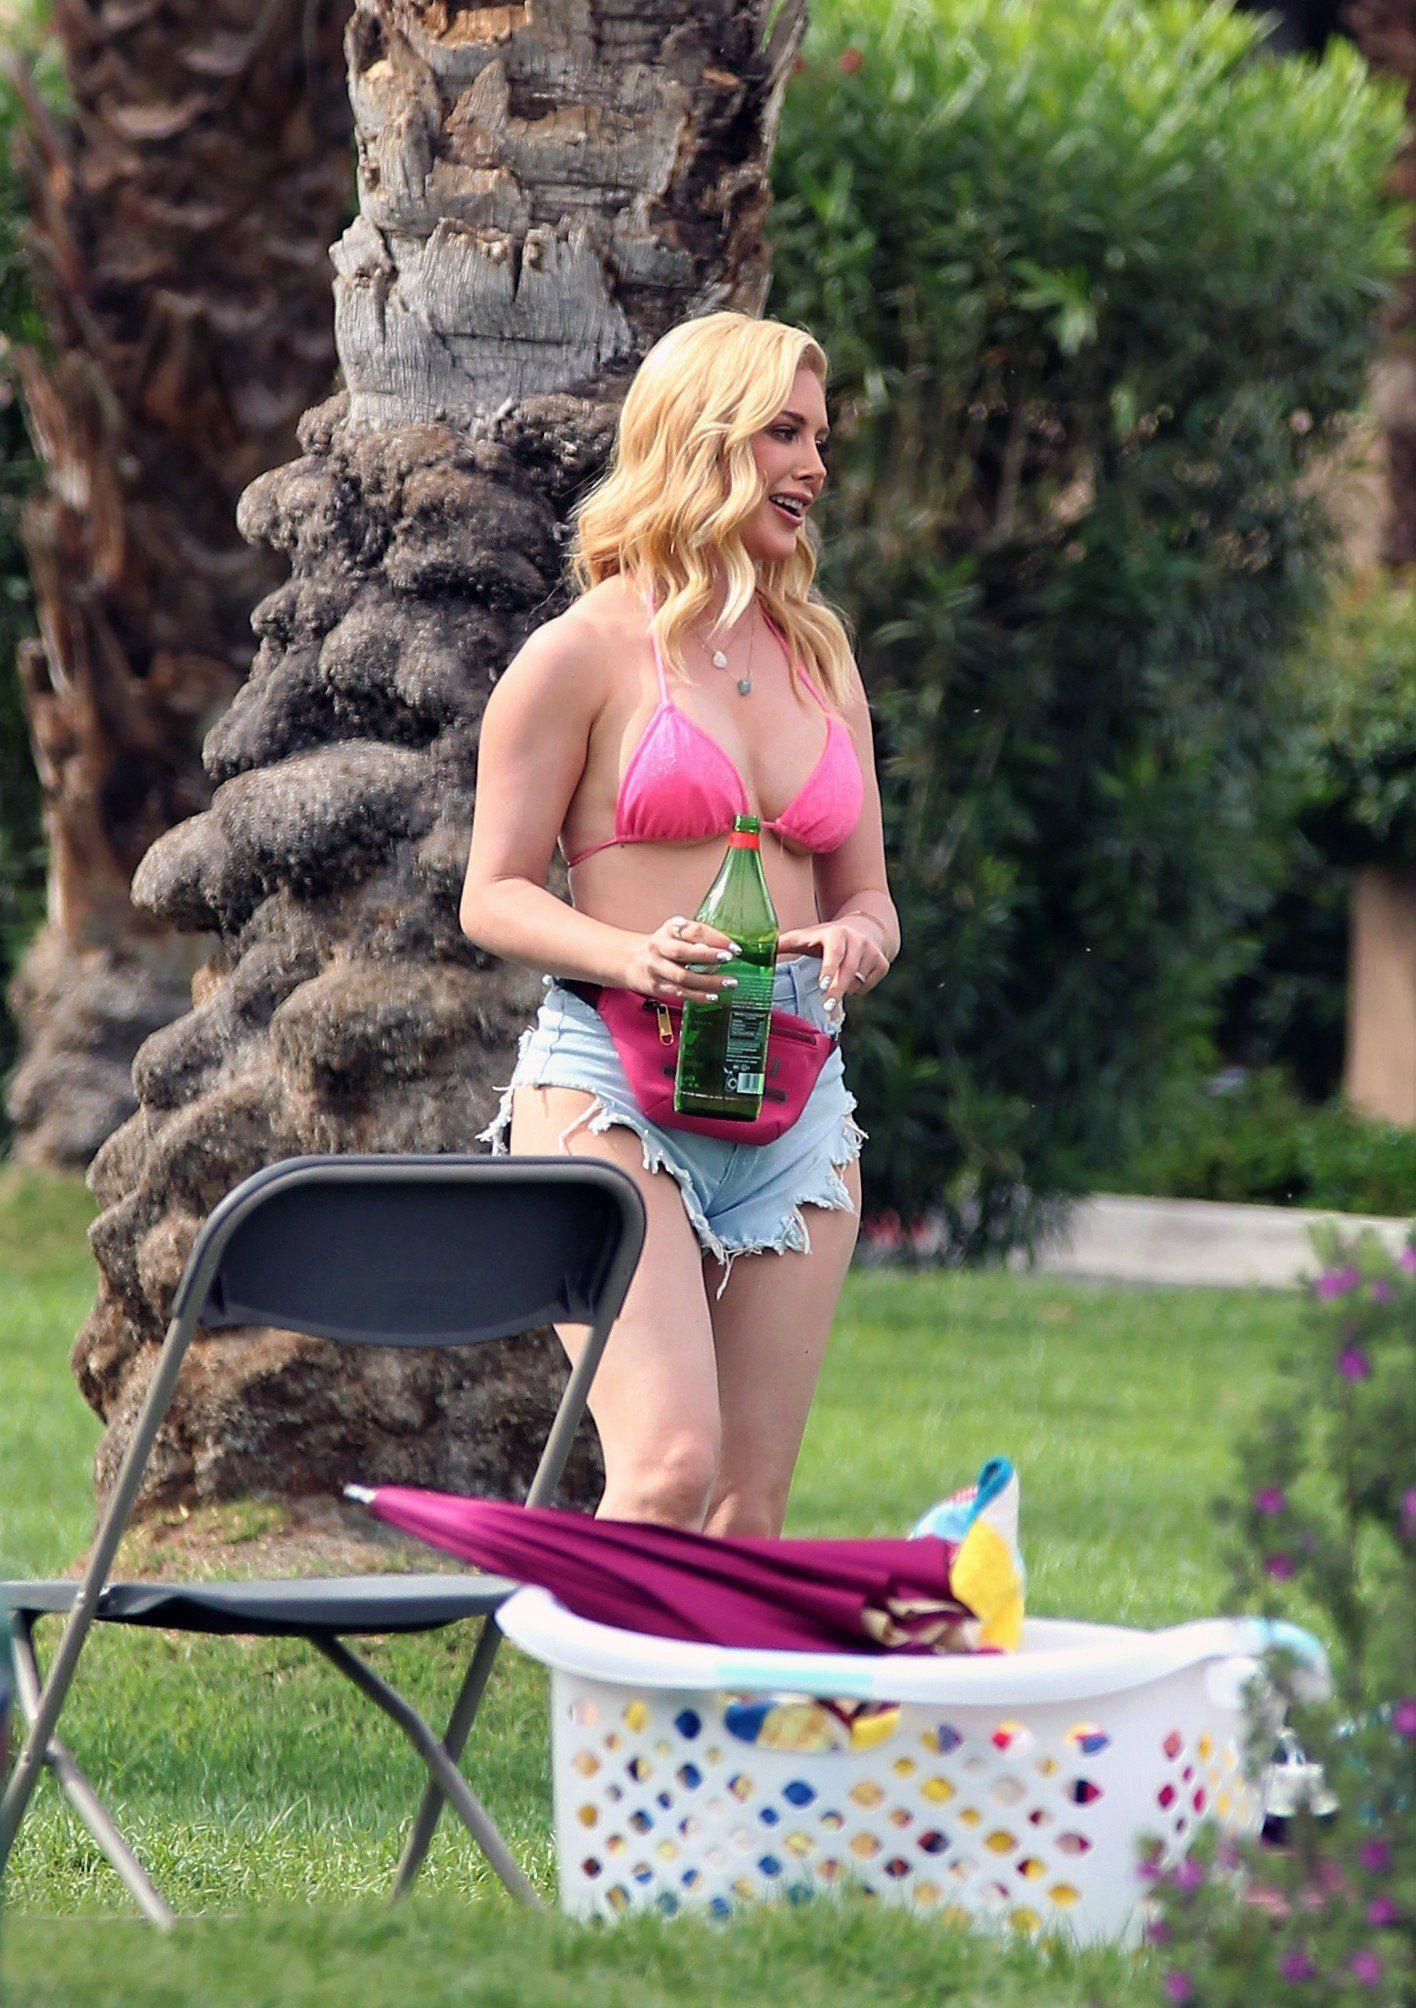 Heidi Montag Sexy In Bikini